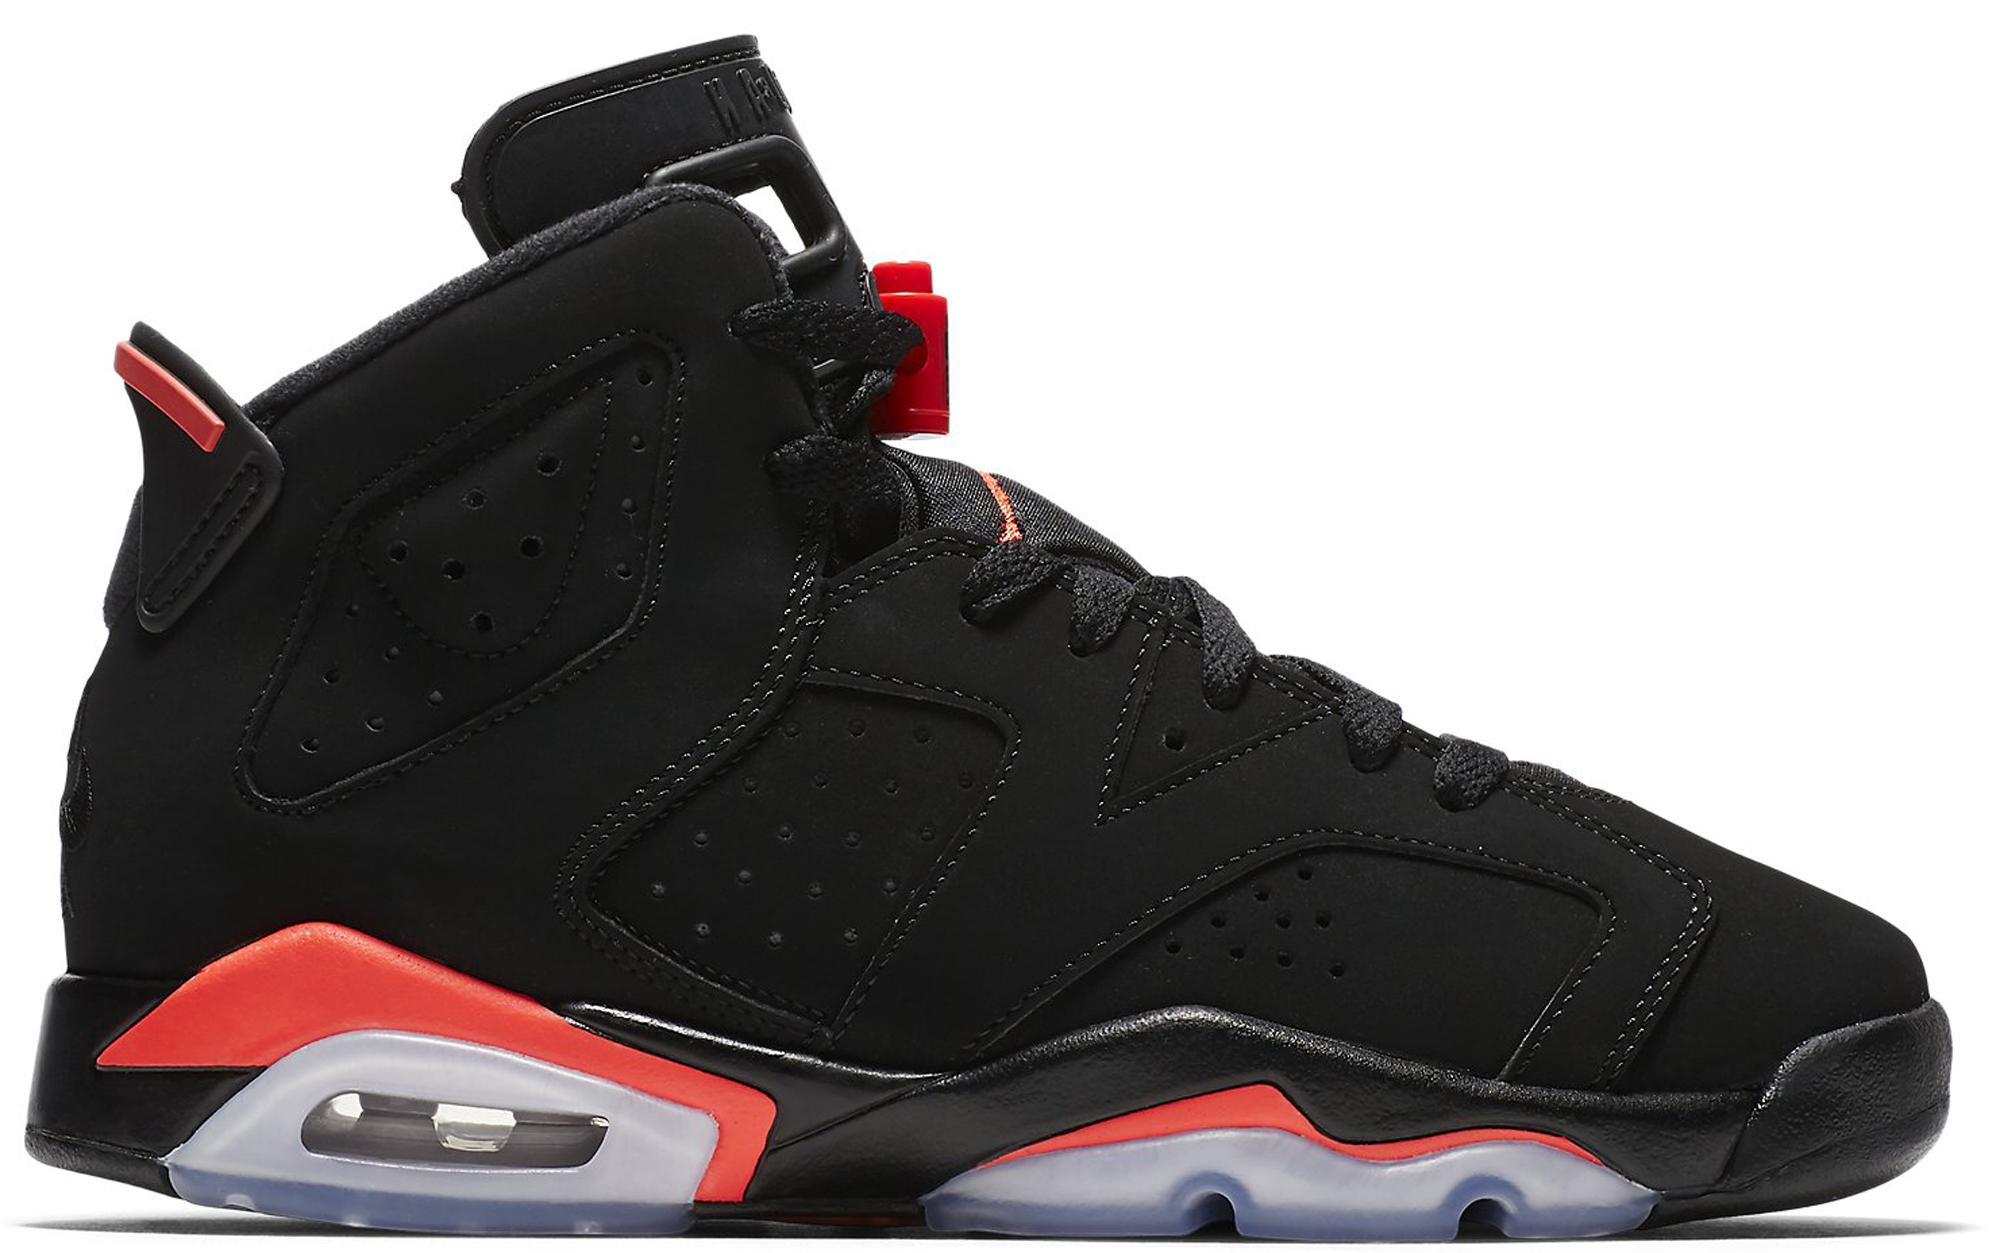 Jordan 6 Retro Black Infrared 2019 (GS)